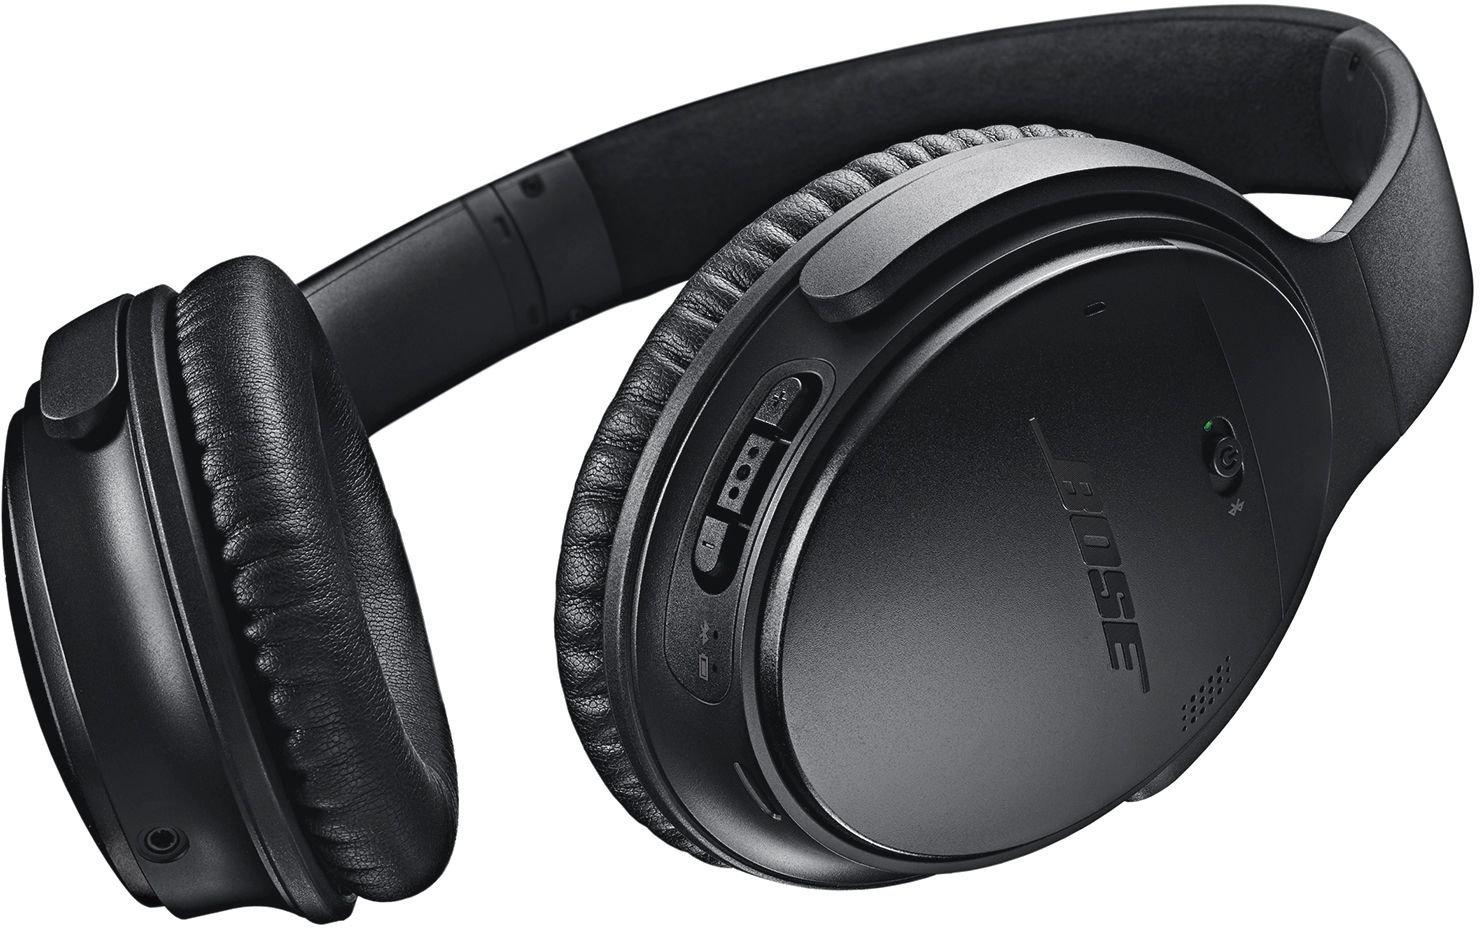 Bose 35 headphones